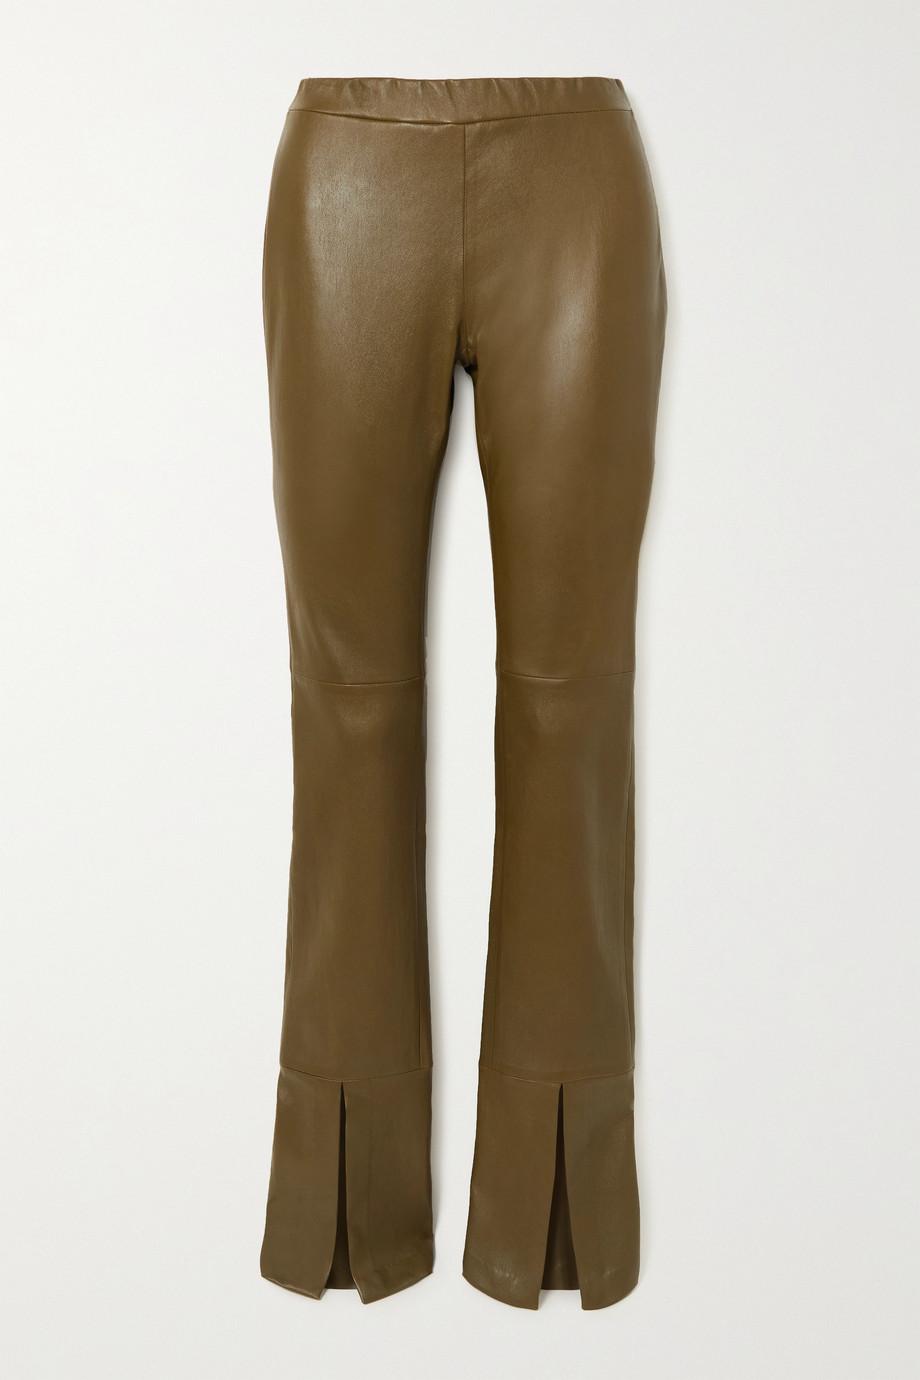 Rosetta Getty Pantalon évasé en cuir